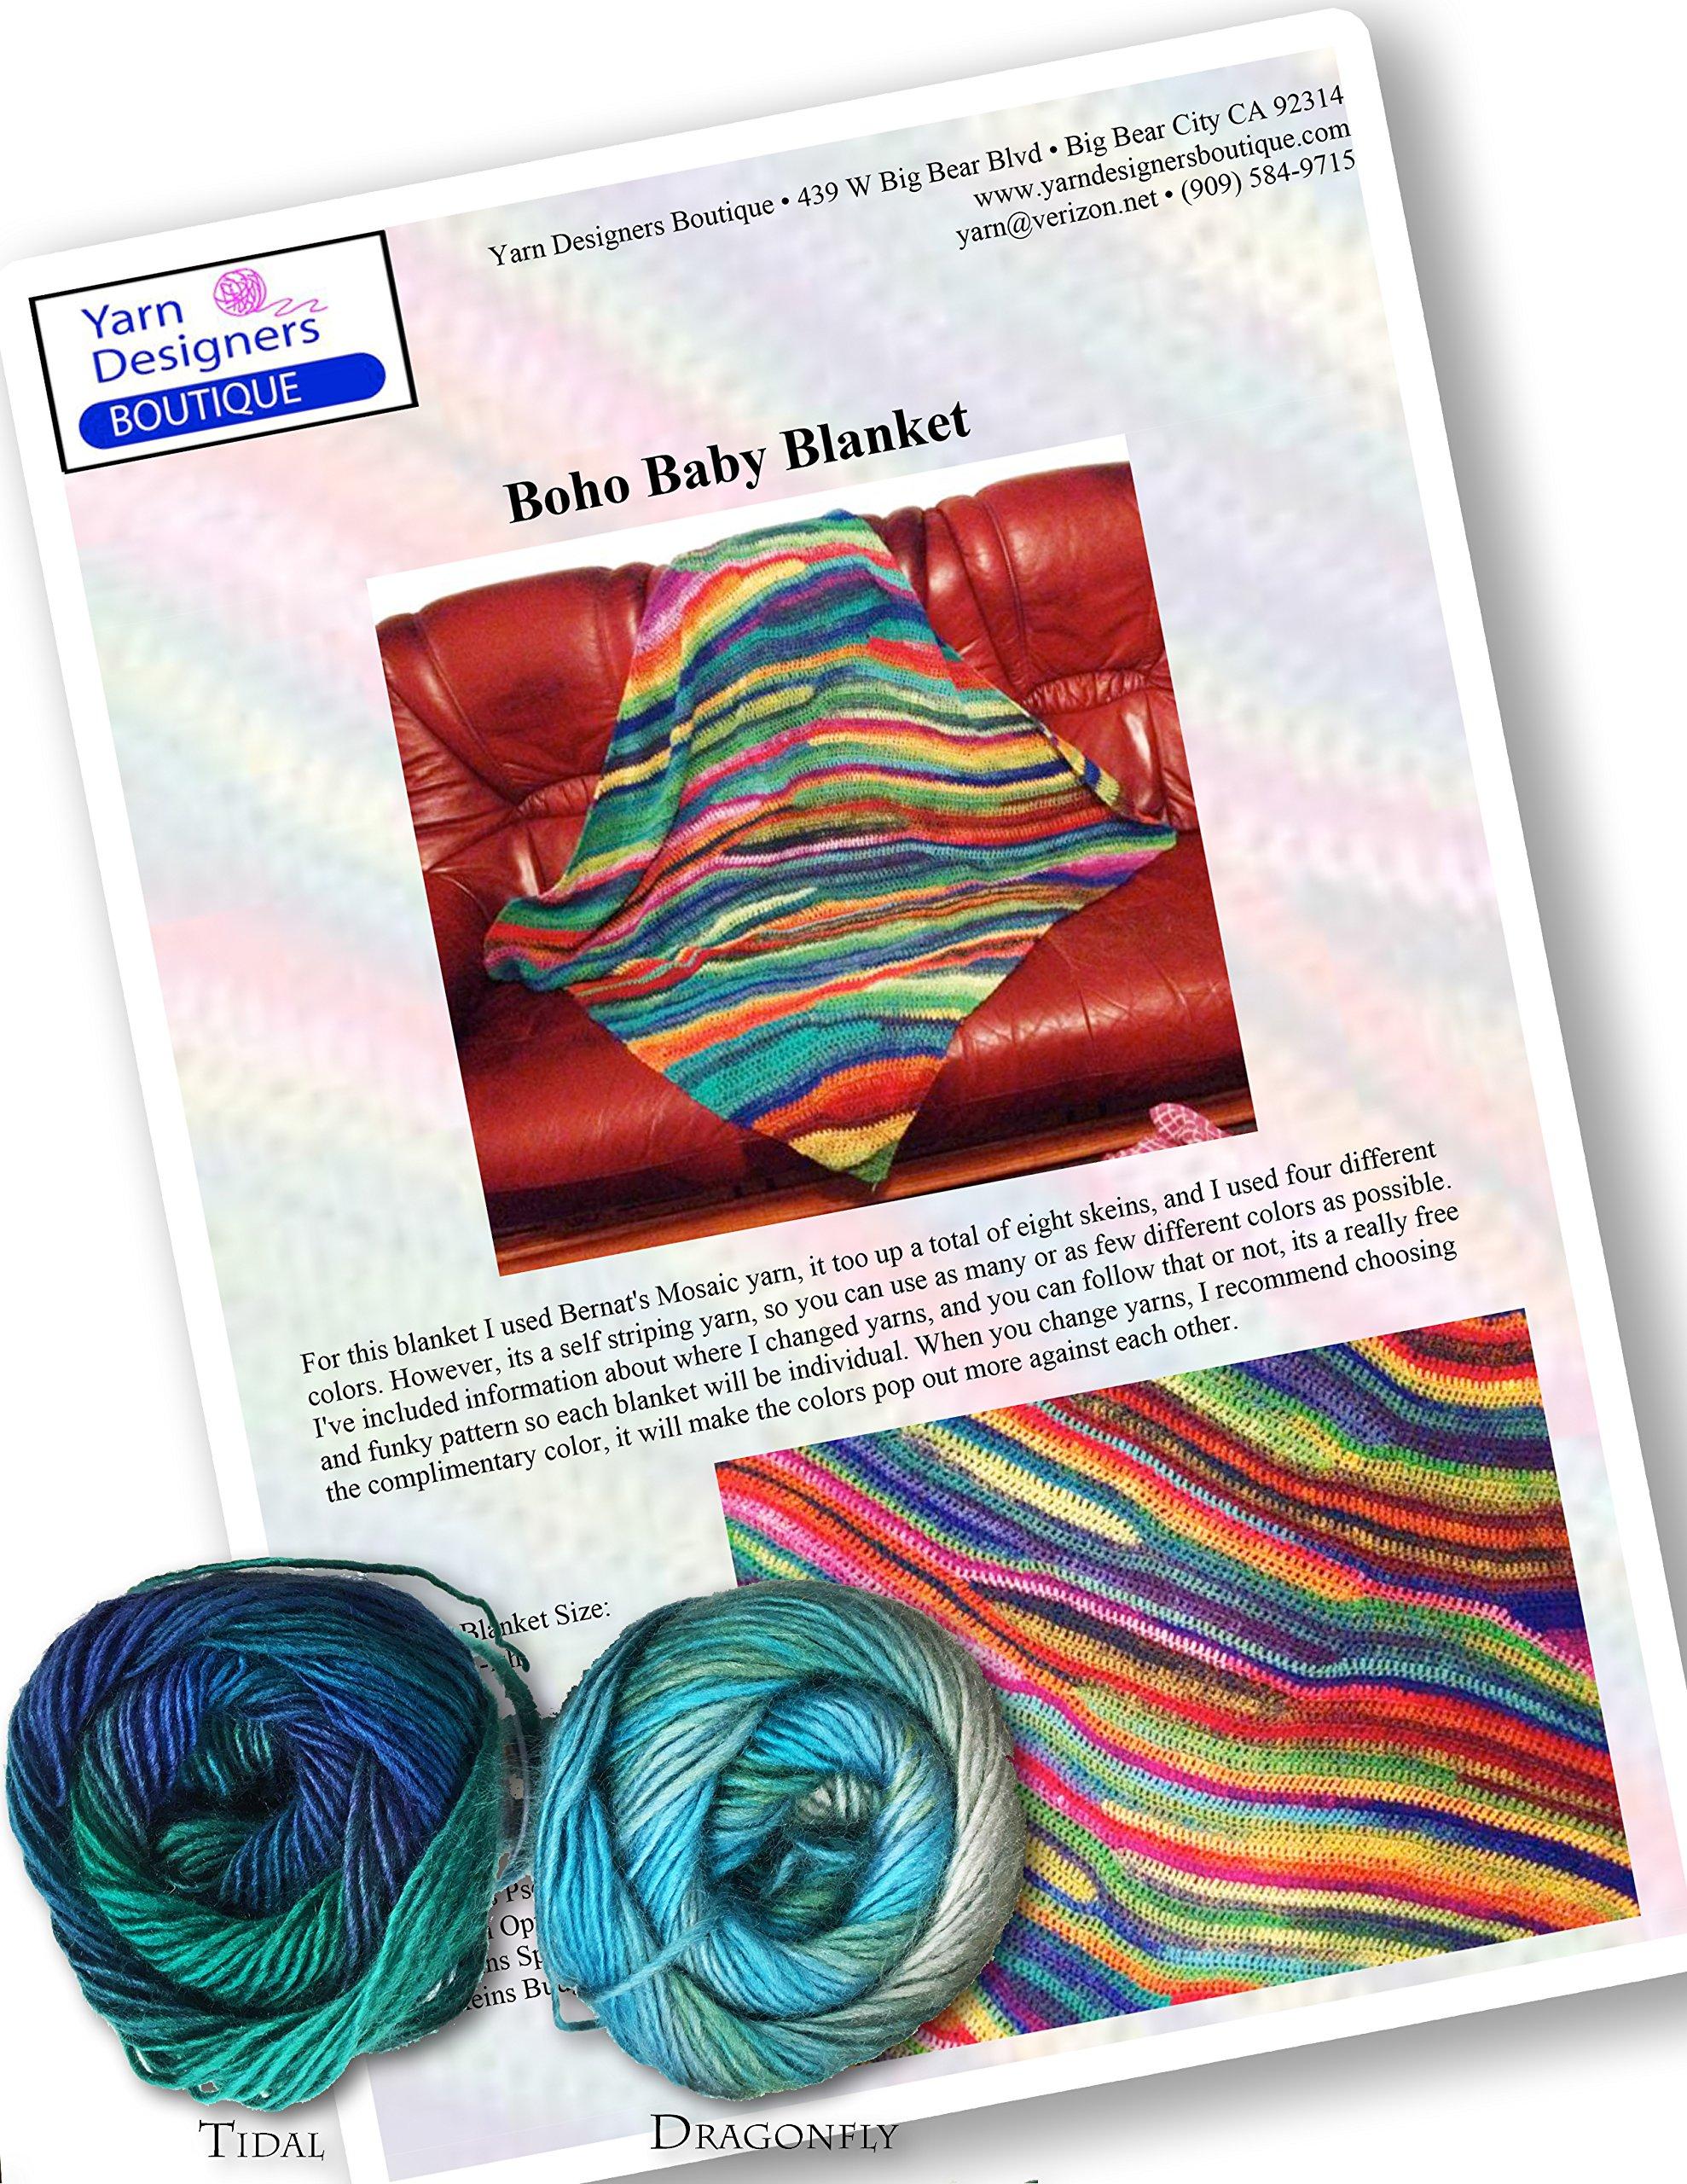 Crochet Kit: Easy Baby Blanket, Self Striping Boho Chic (Dragonfly and Tidal)